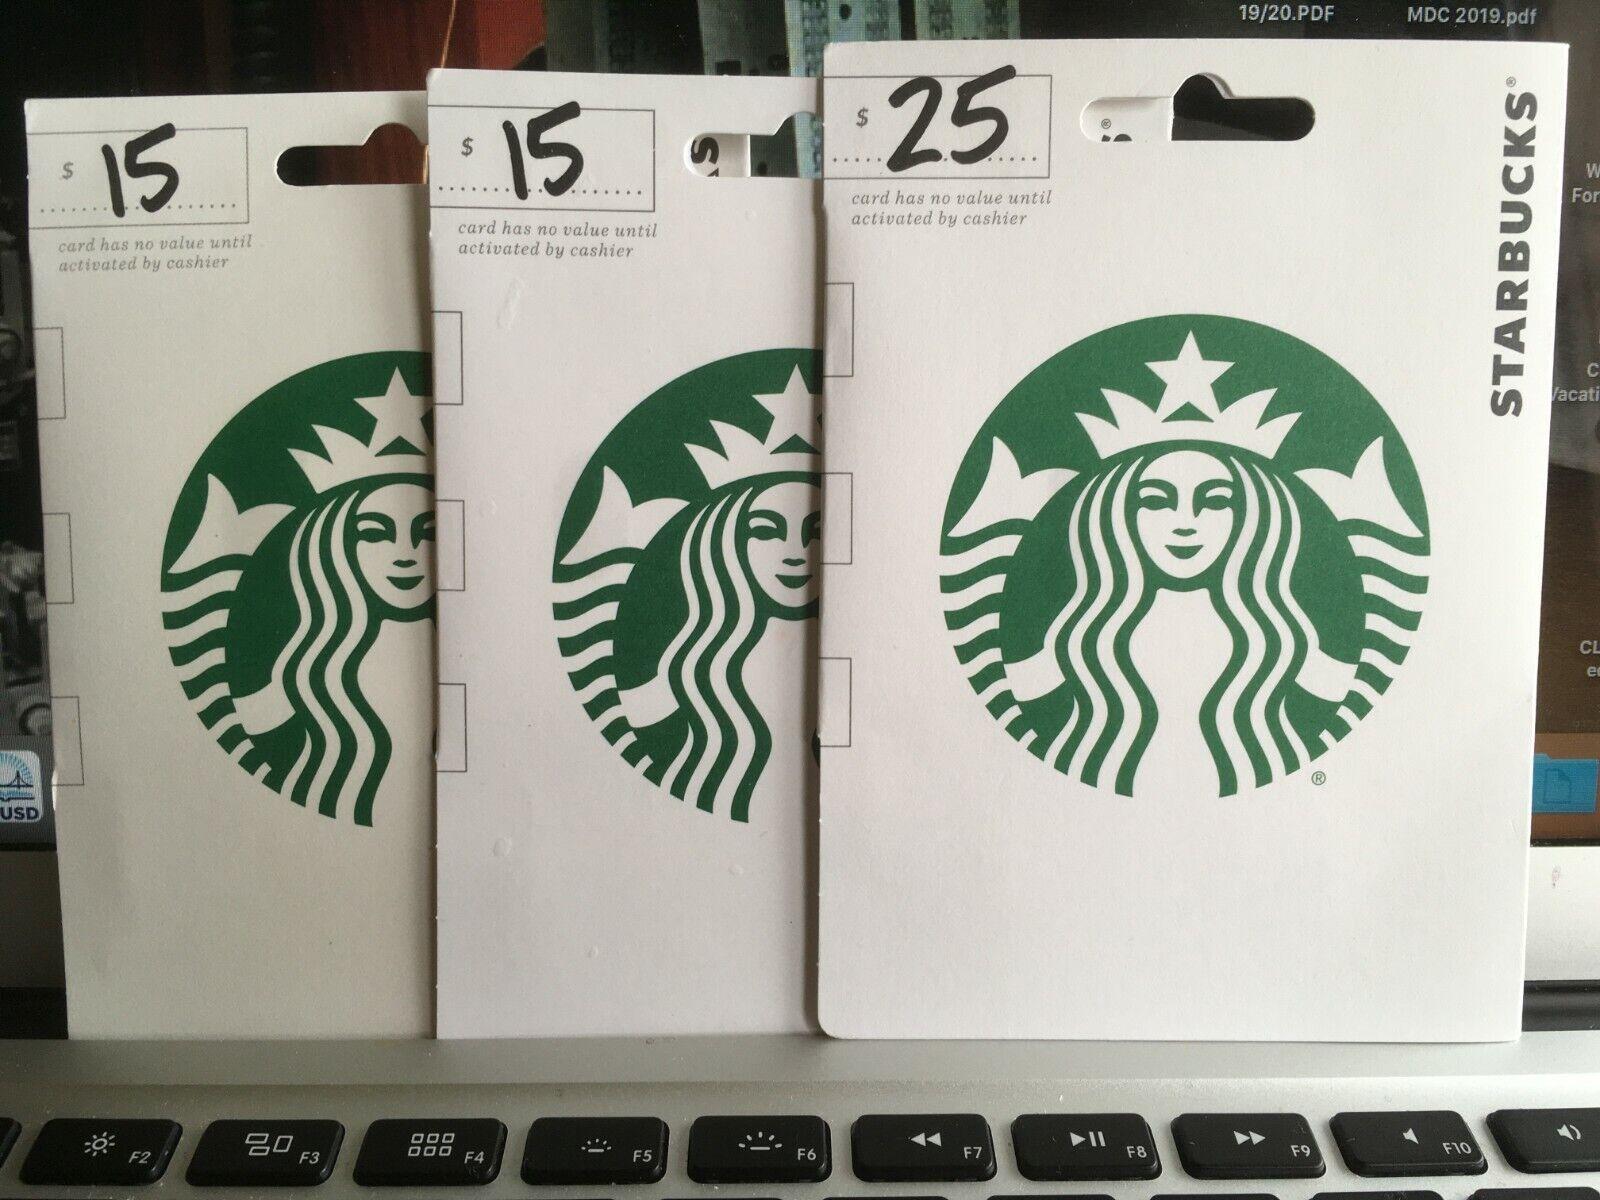 Starbucks Gift Card - Balance 50.00 - $41.00